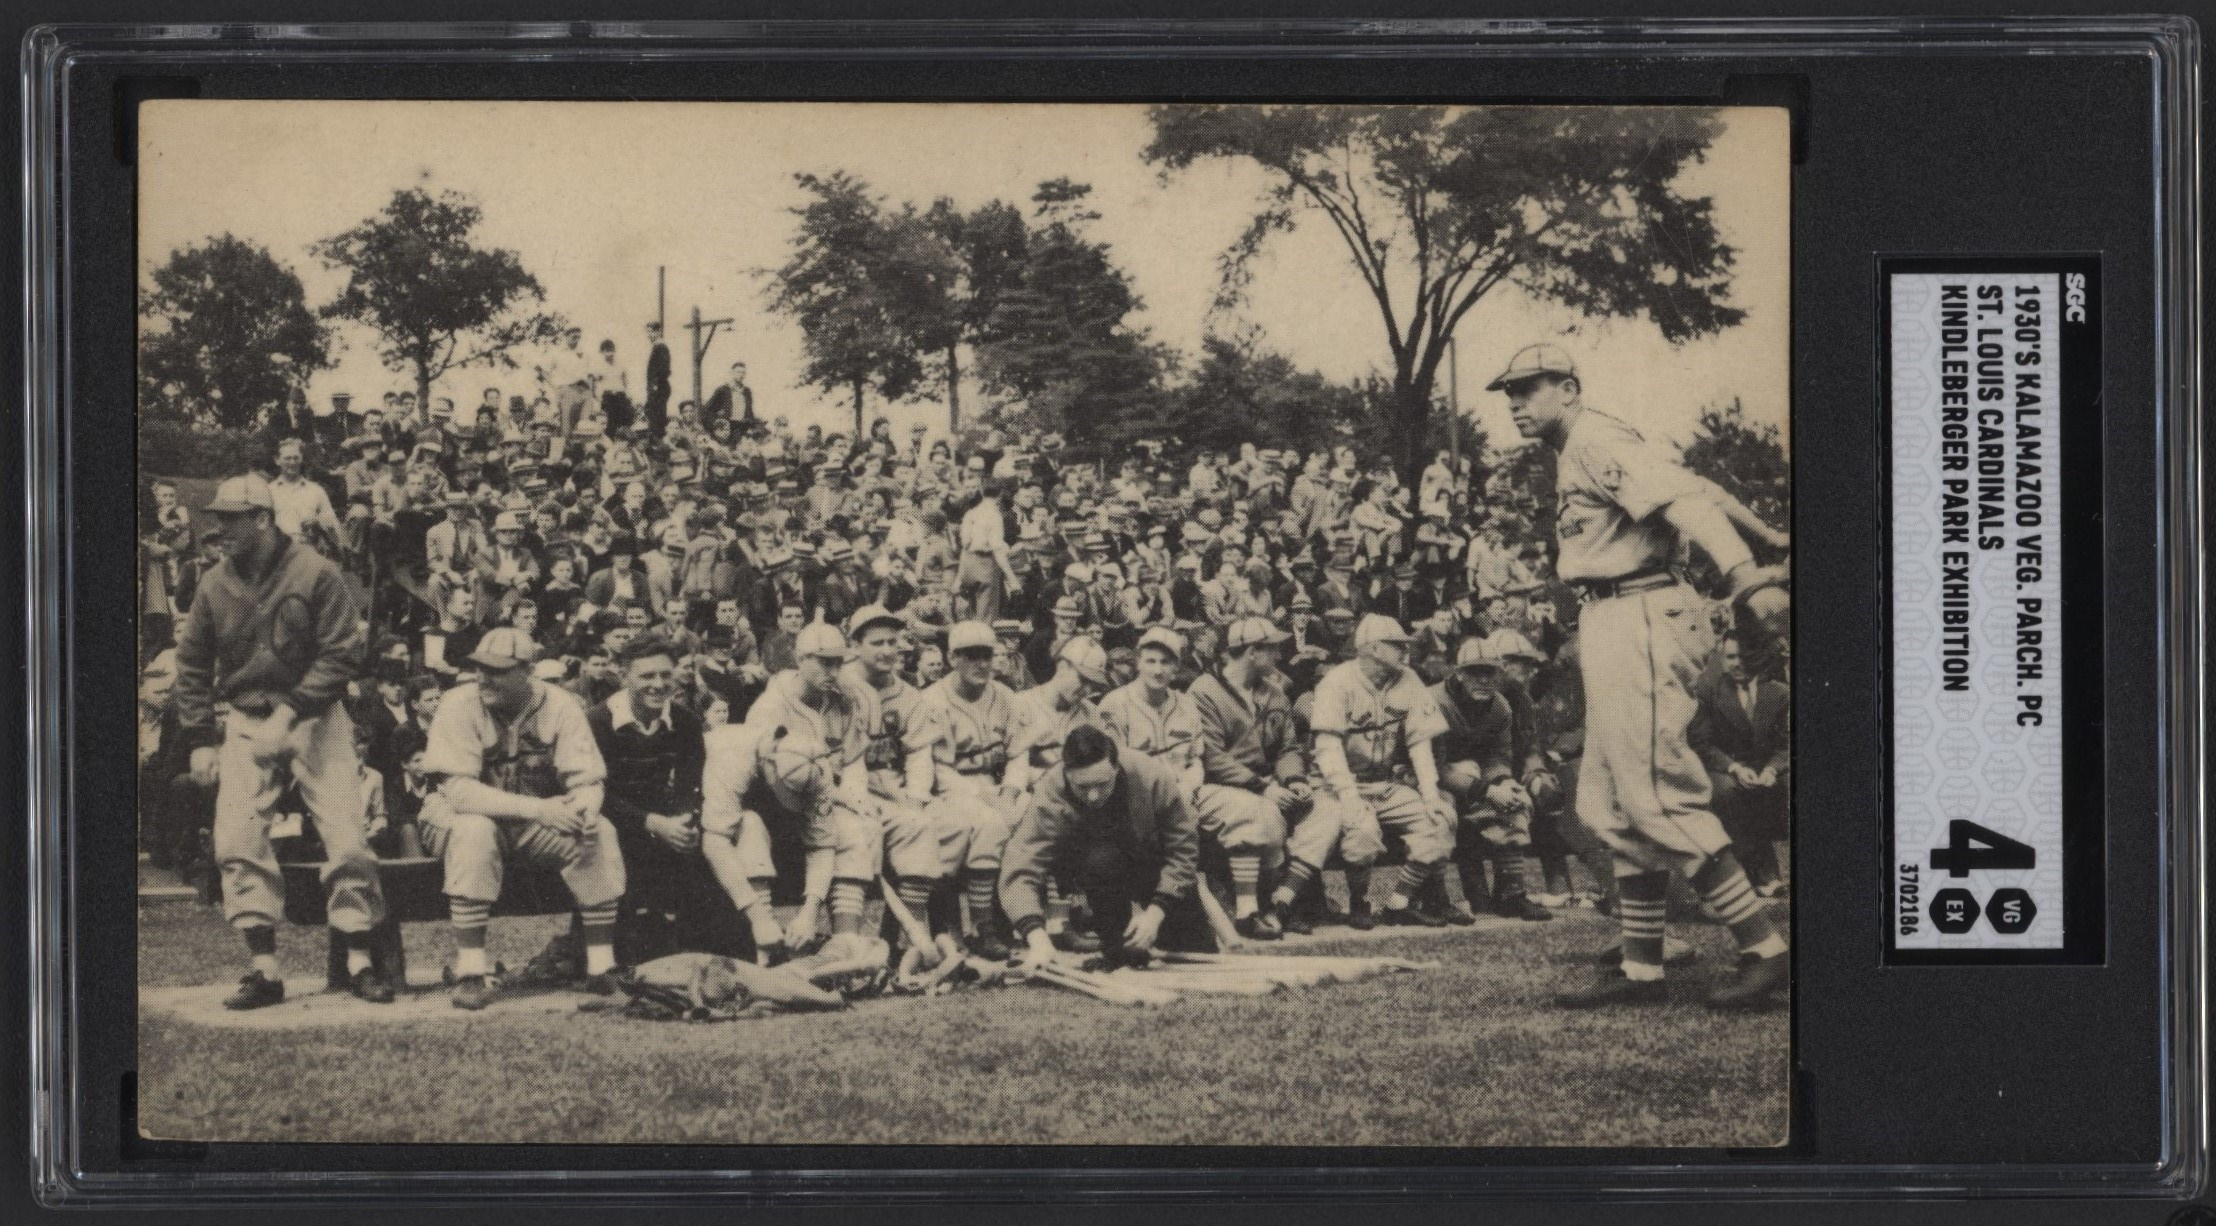 Baseball Memorabilia - Monthly 11-18